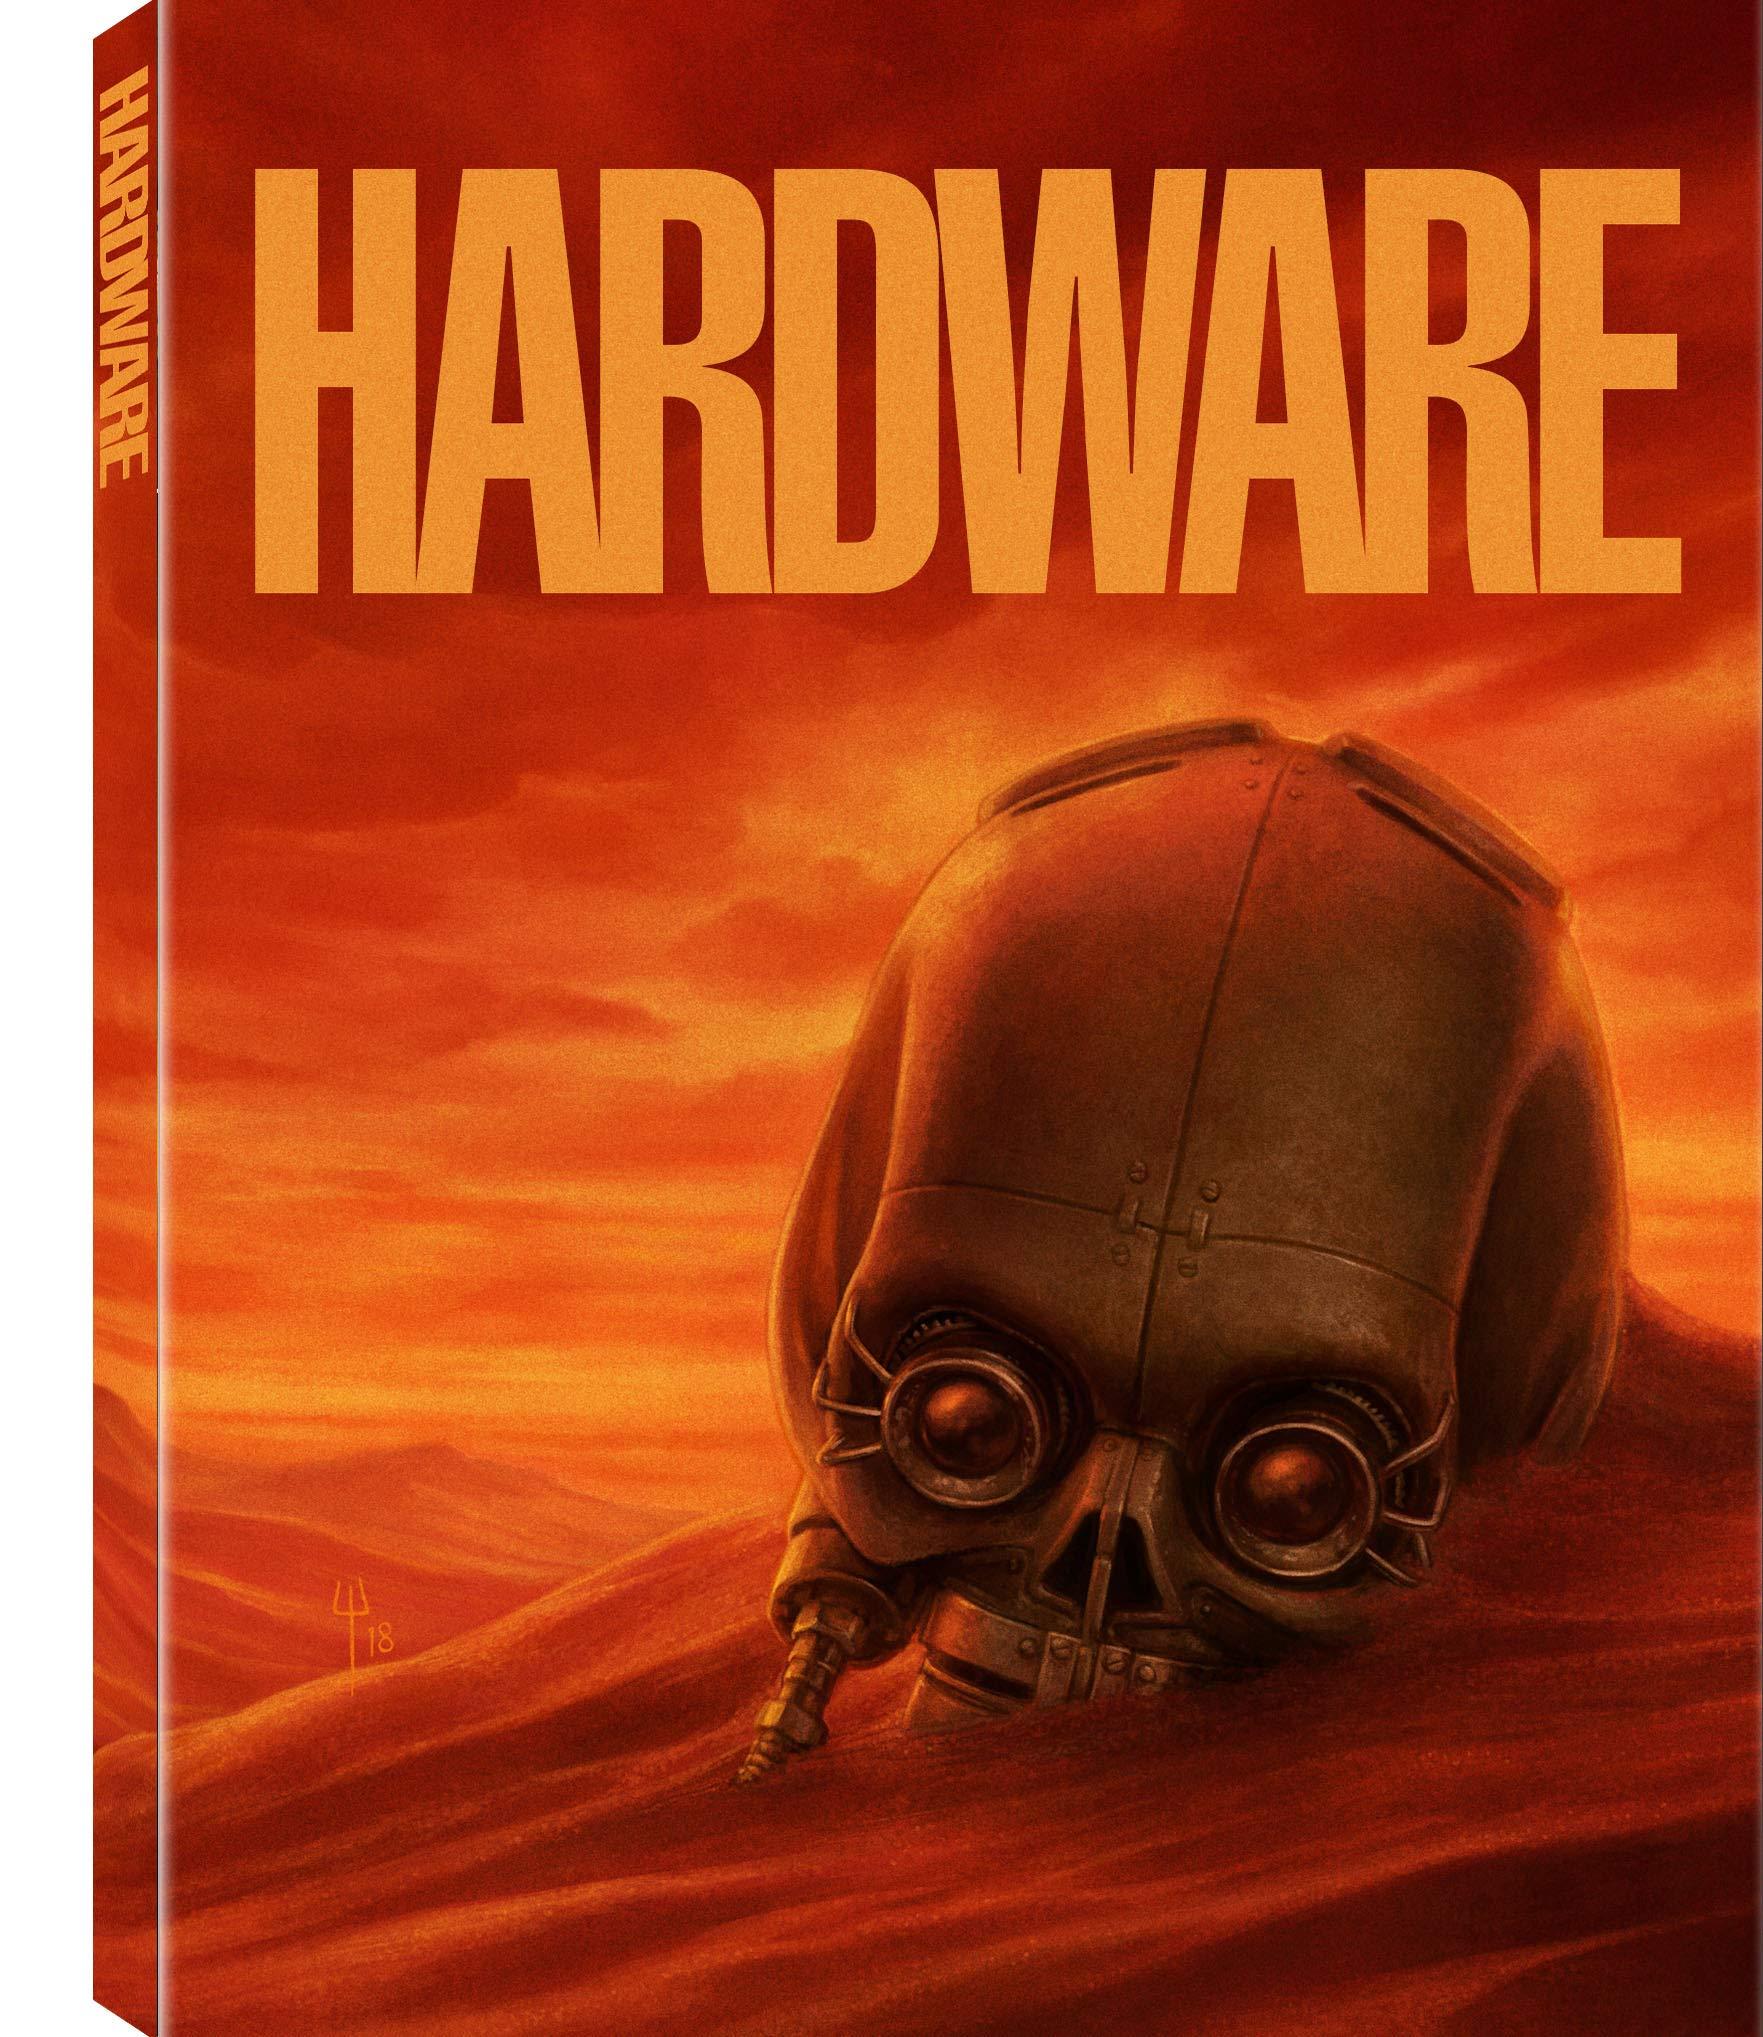 Hardware 2 Disc Set (Blu-ray)